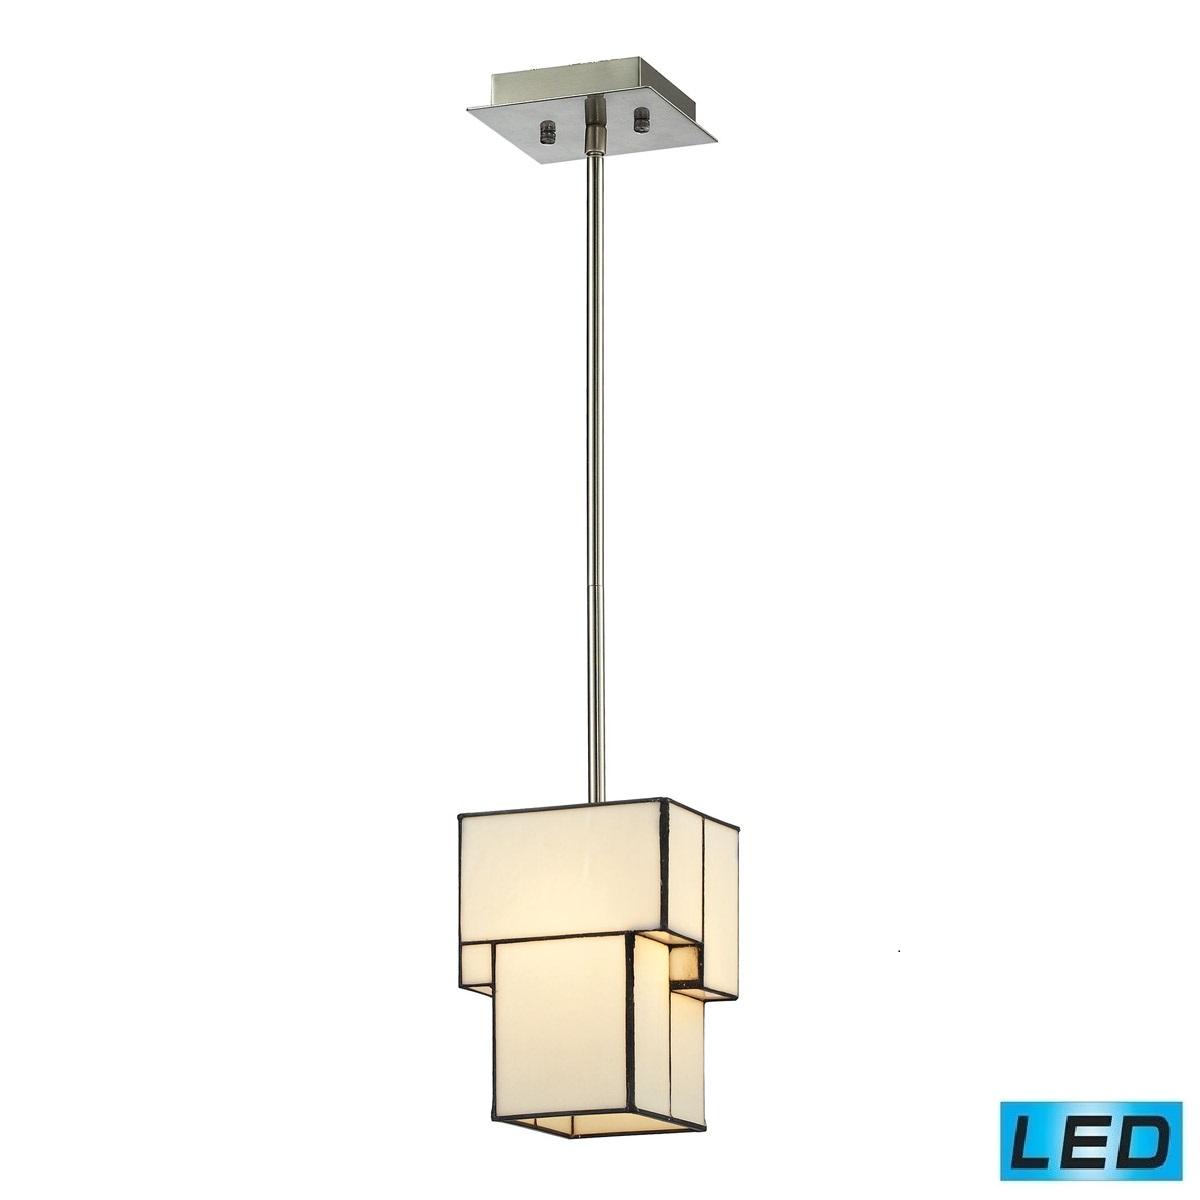 ELK Lighting, Pendant Lighting Brooklyn, Accentuations Brand, Furniture by ABD